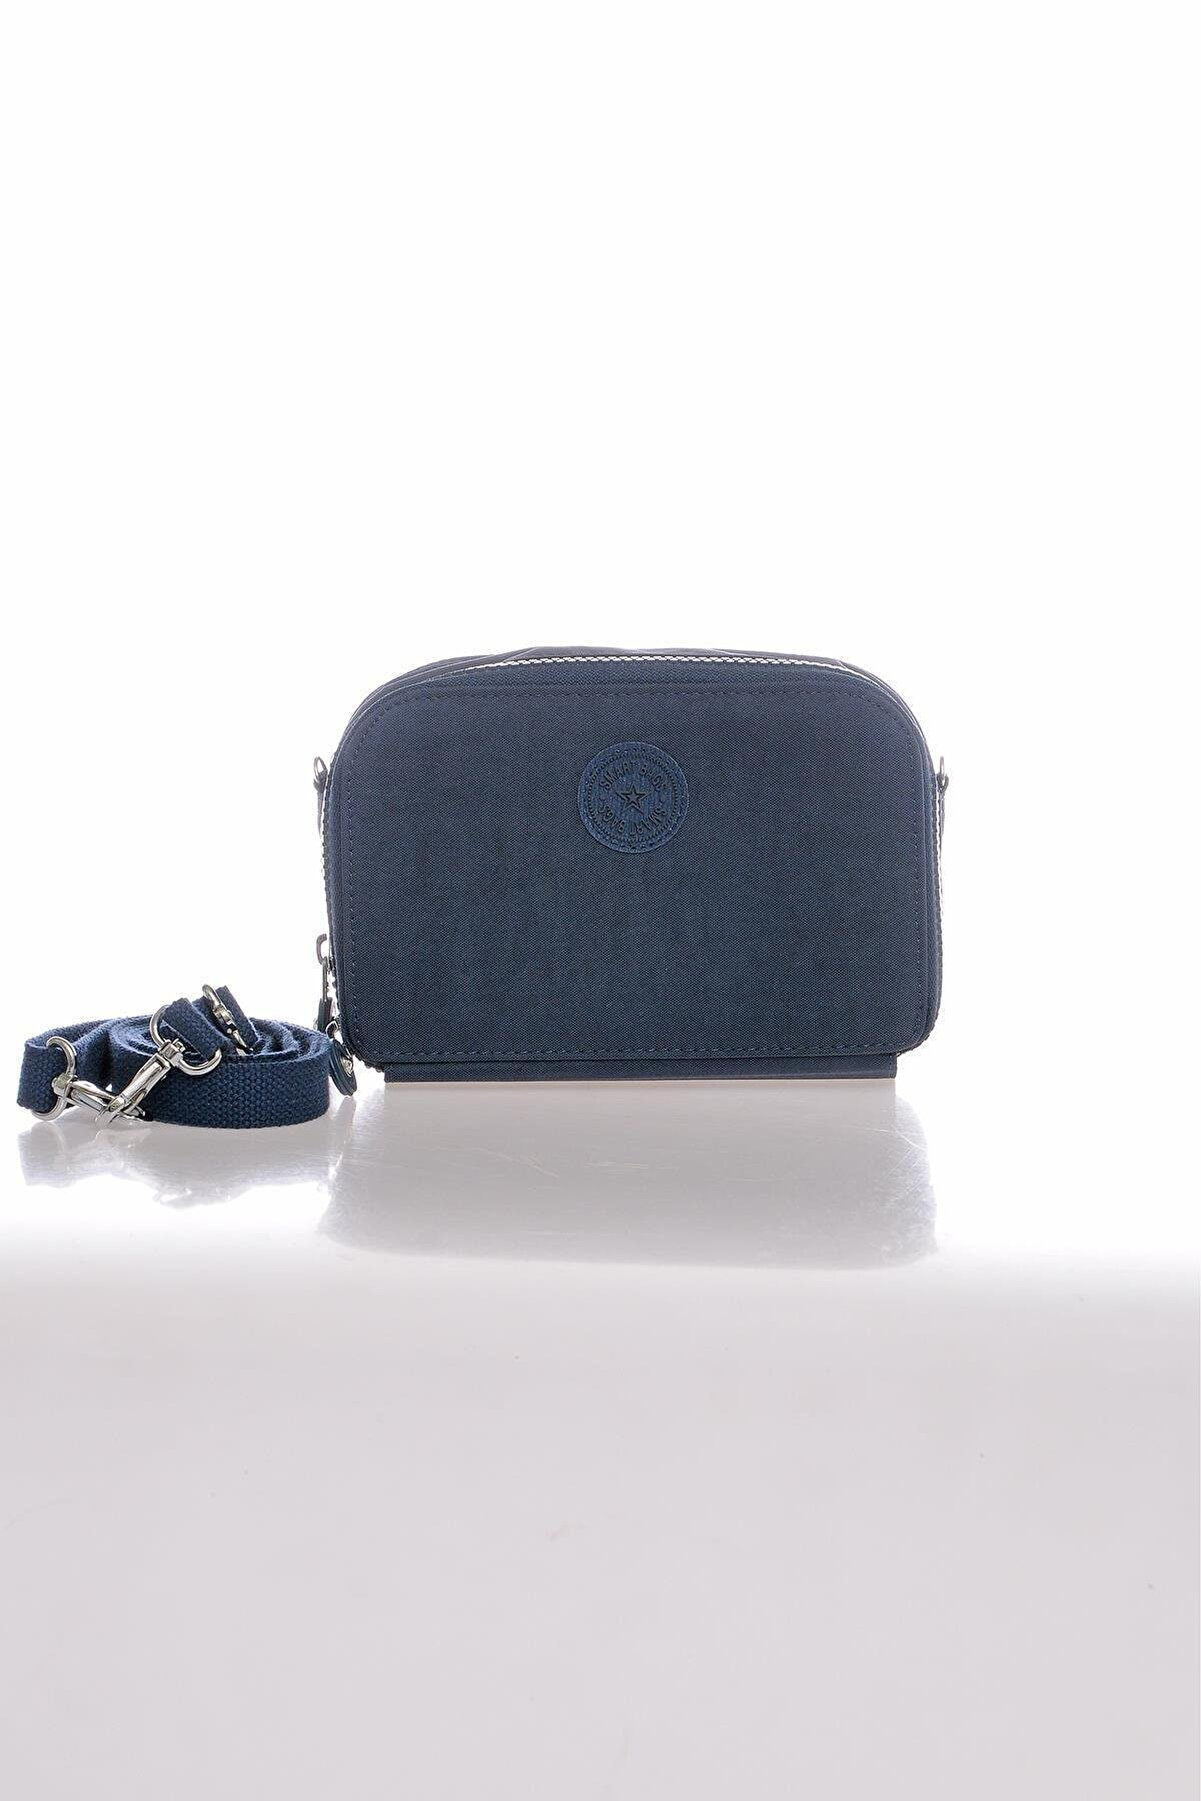 Smart Bags Kadın Lacivert Portföy